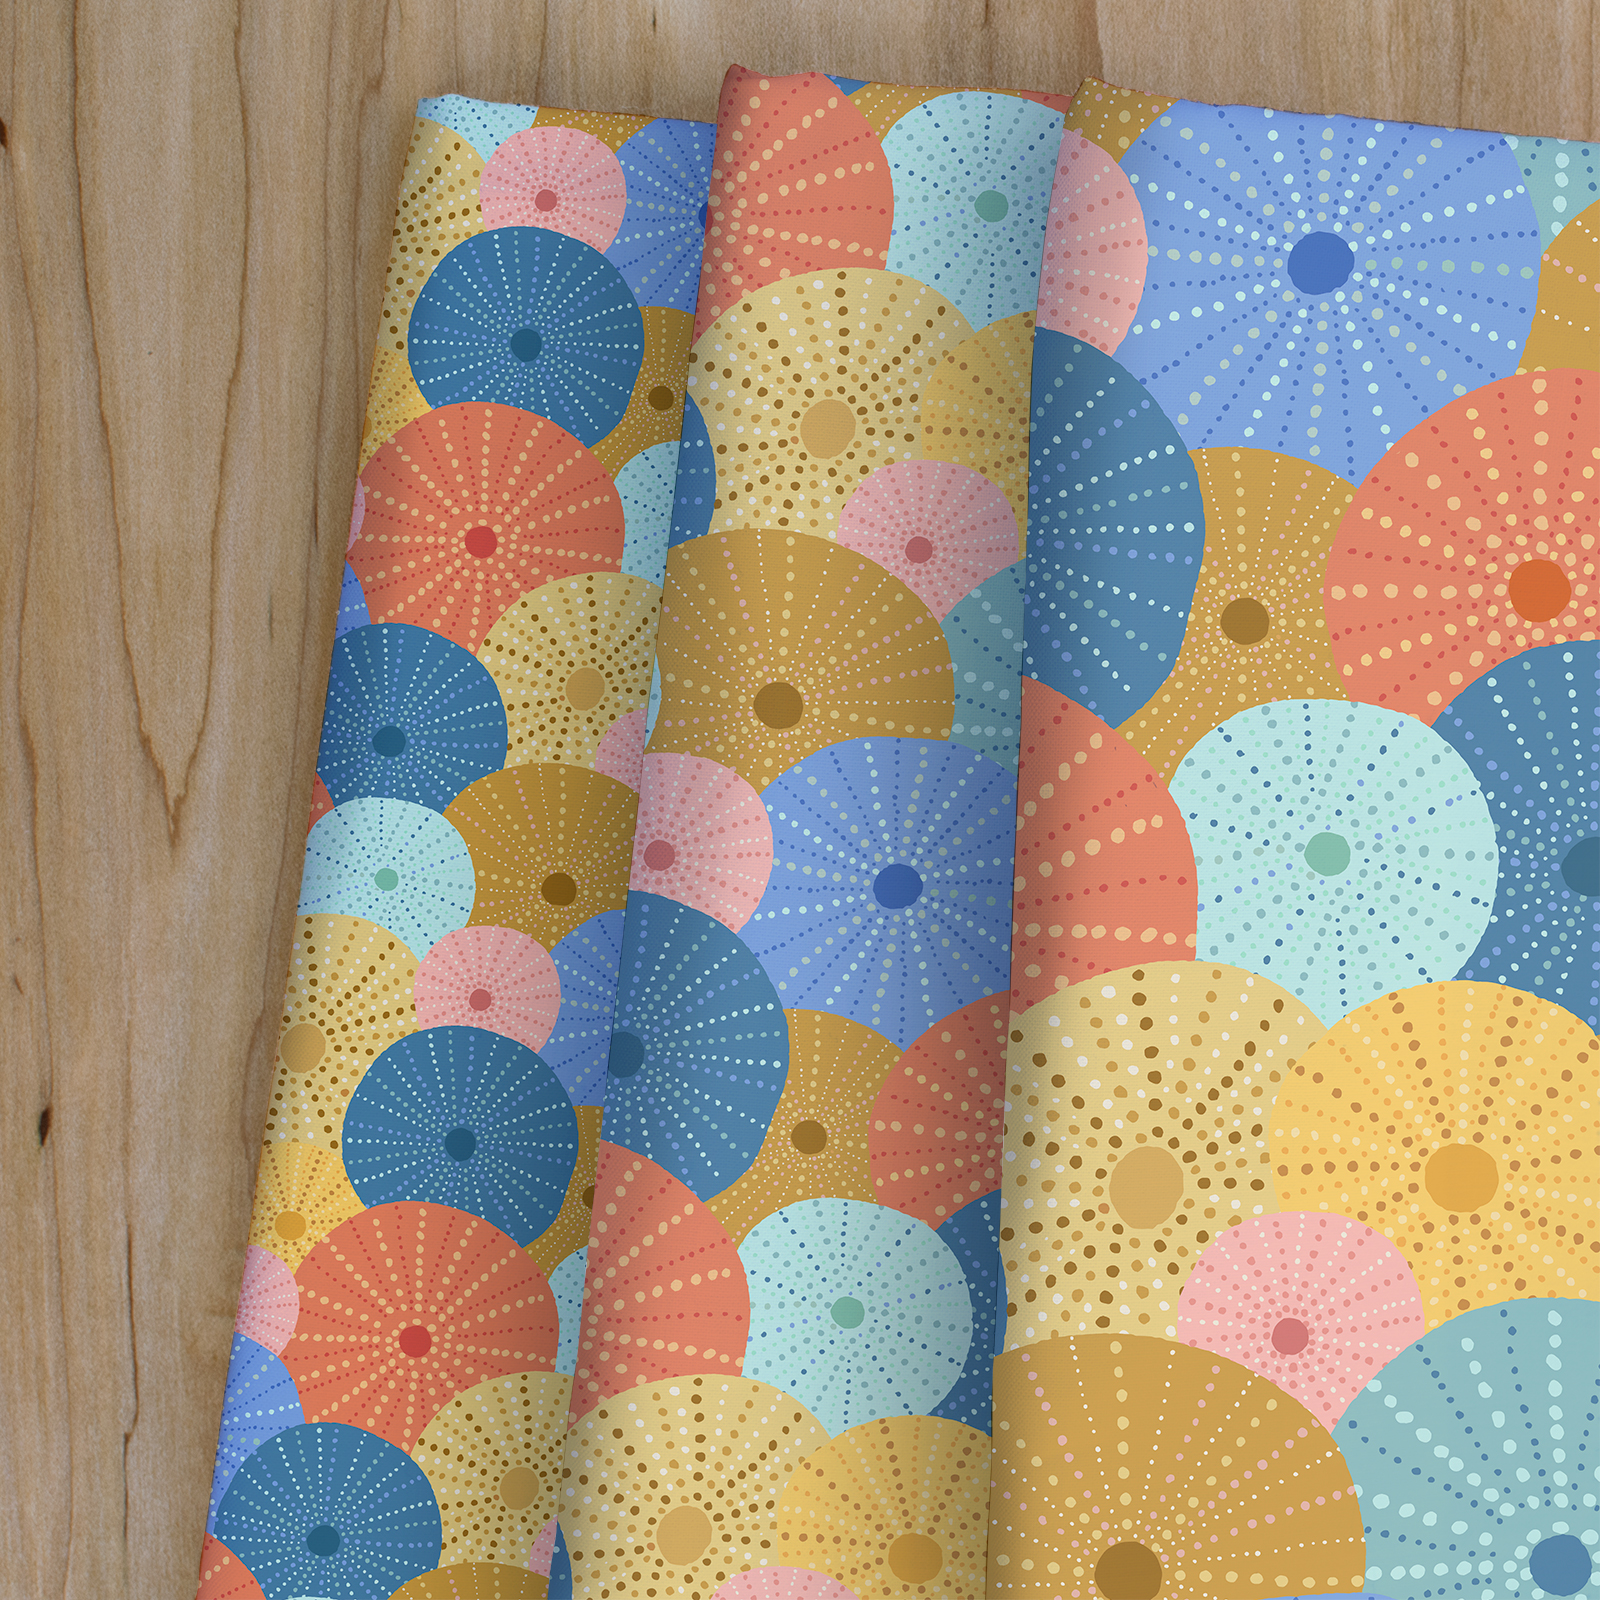 fabric-3up-mockup1.jpg